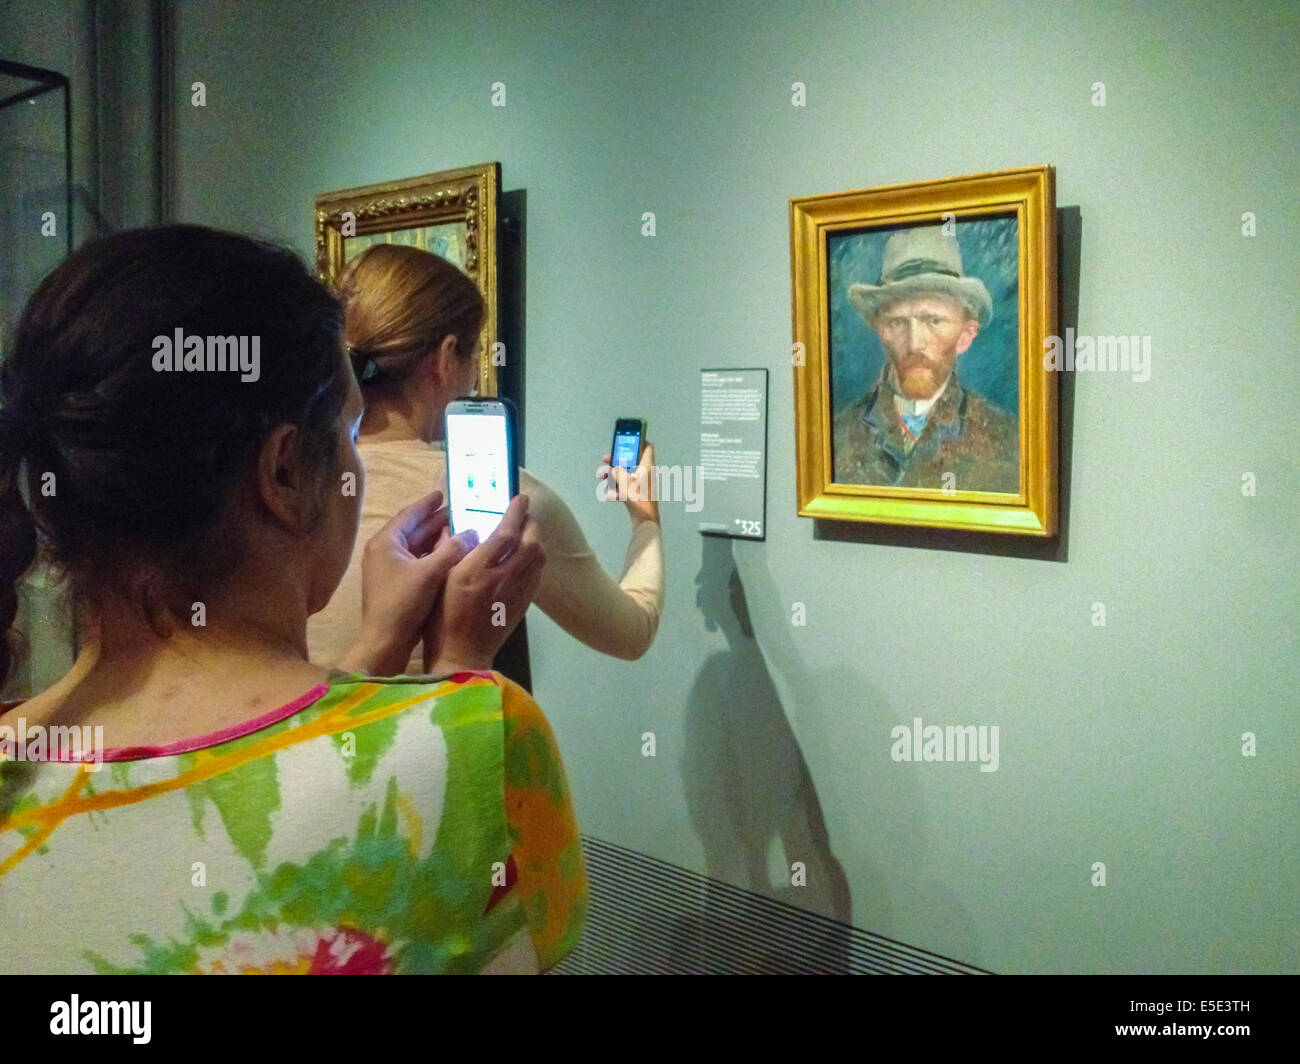 Amsterdam holland niederlande touristen fotos inside art